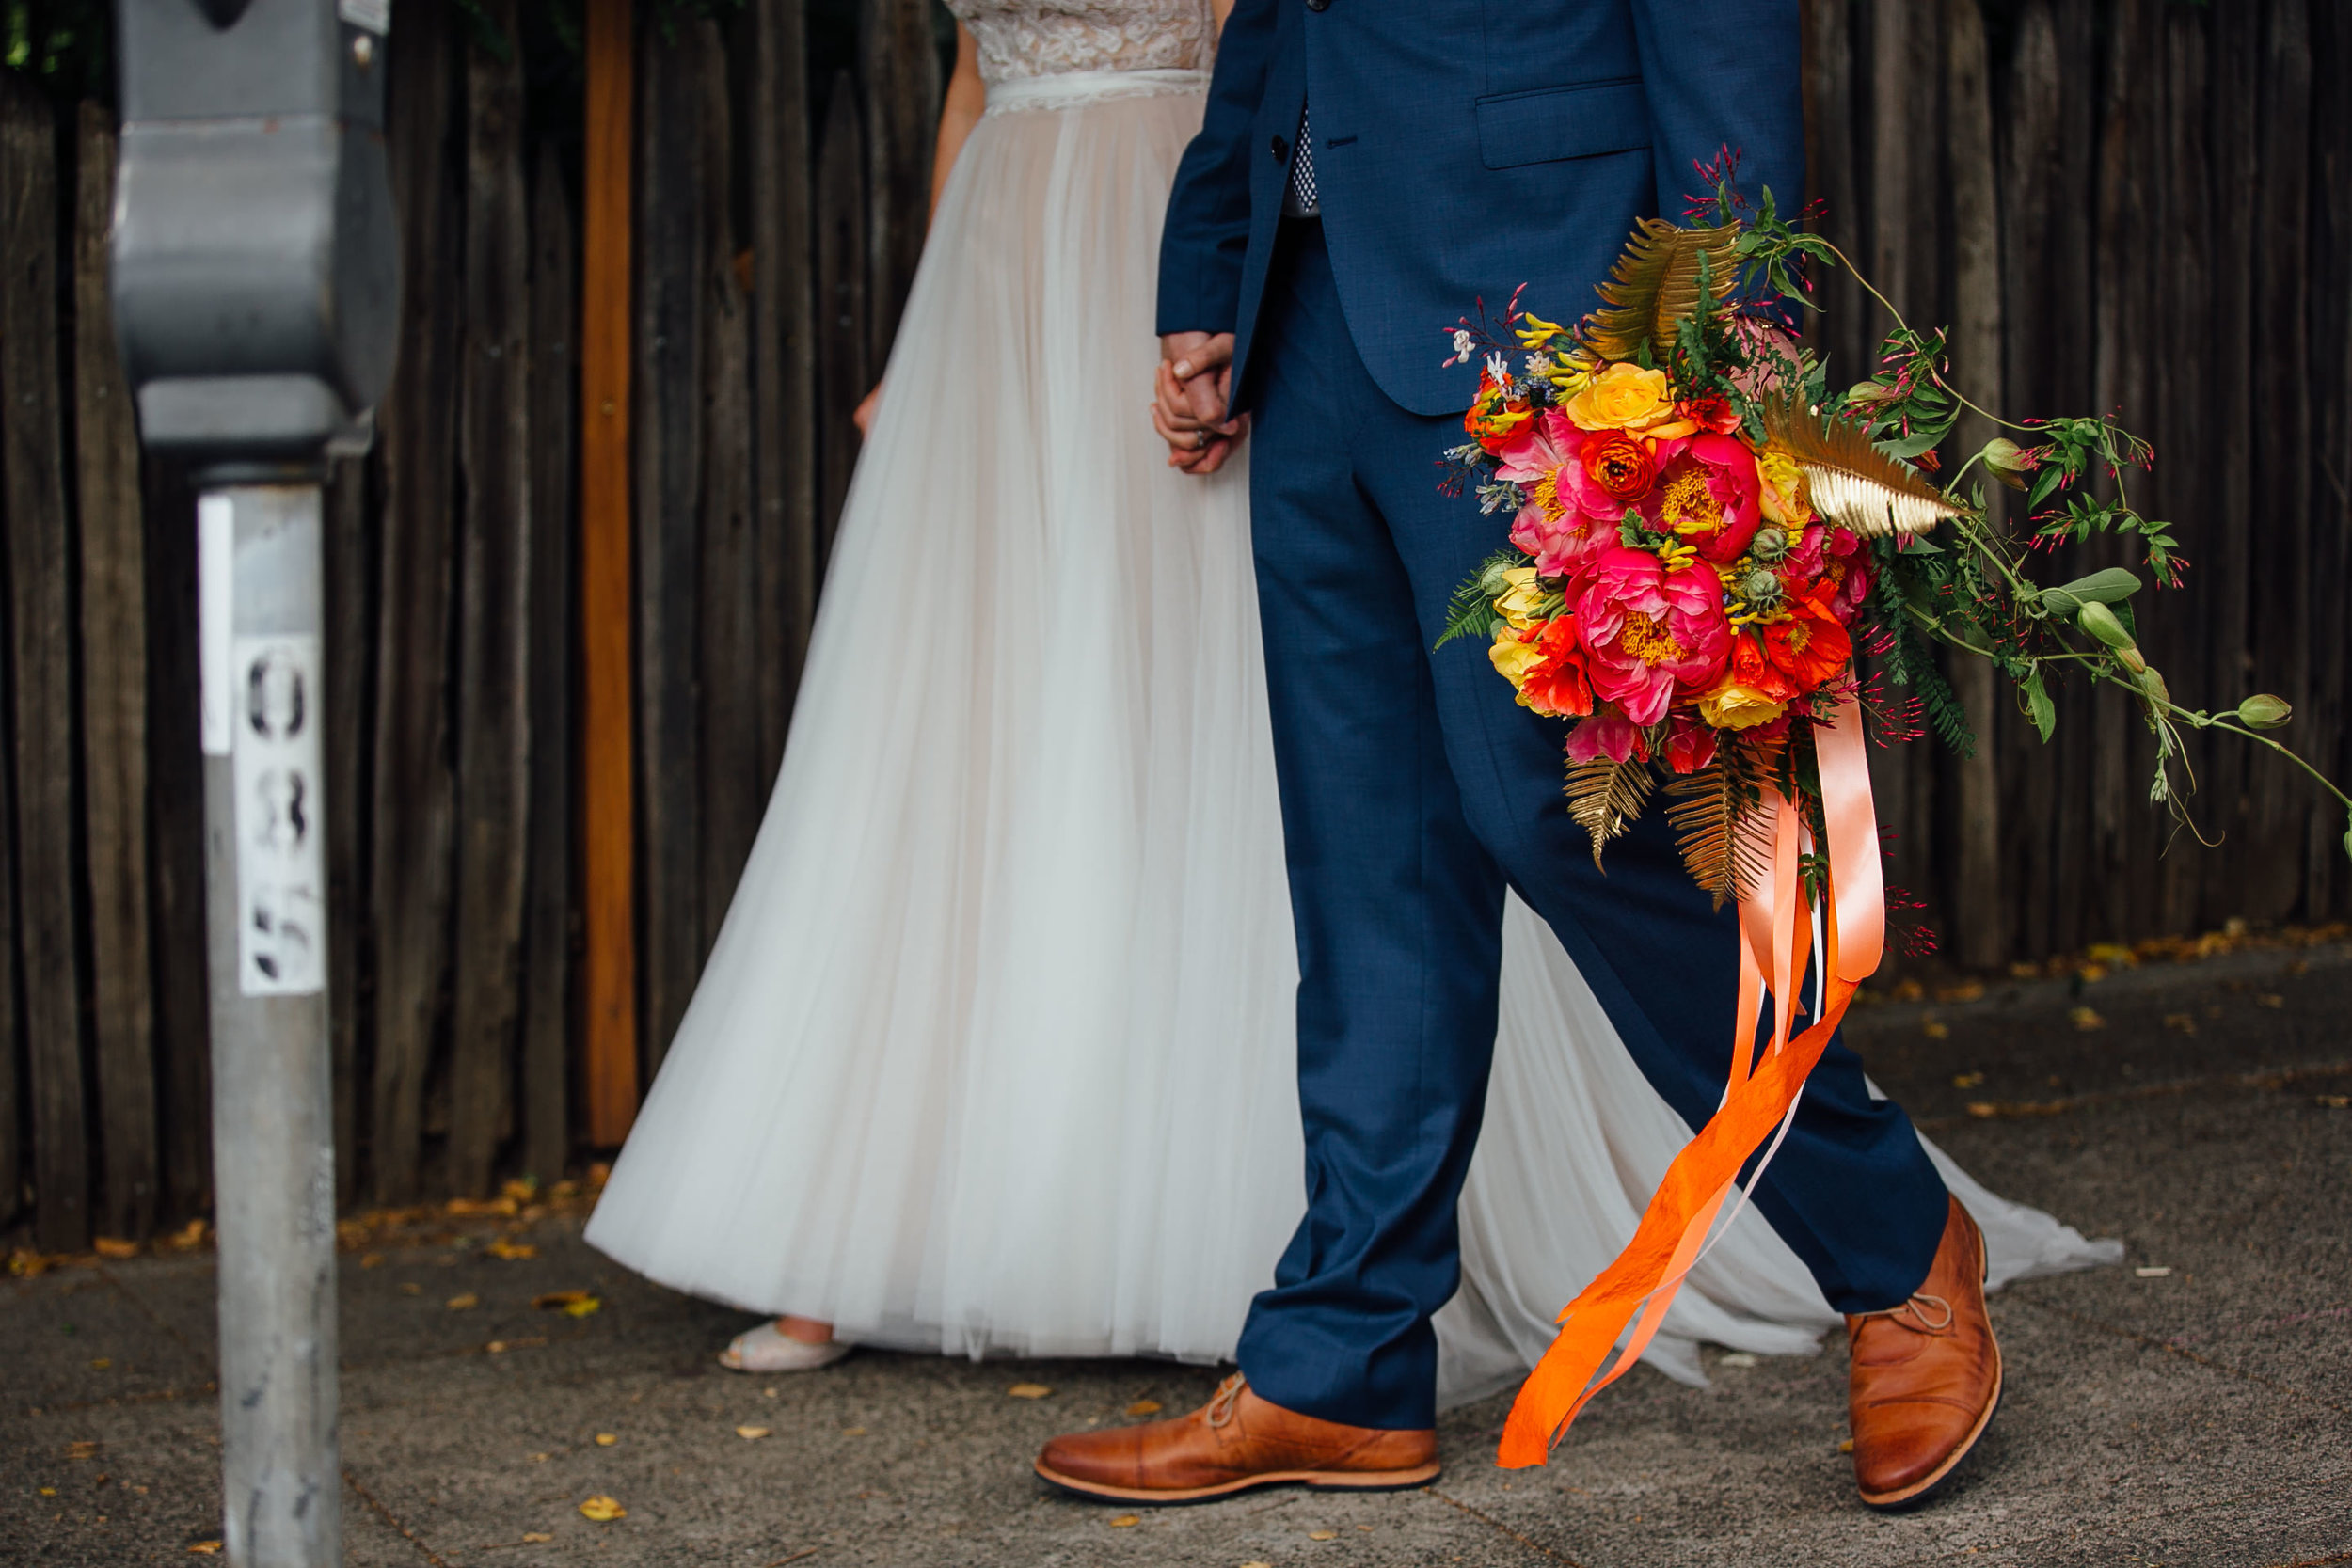 Wedding_Joelle&Ben_C1_20150605_697.jpg